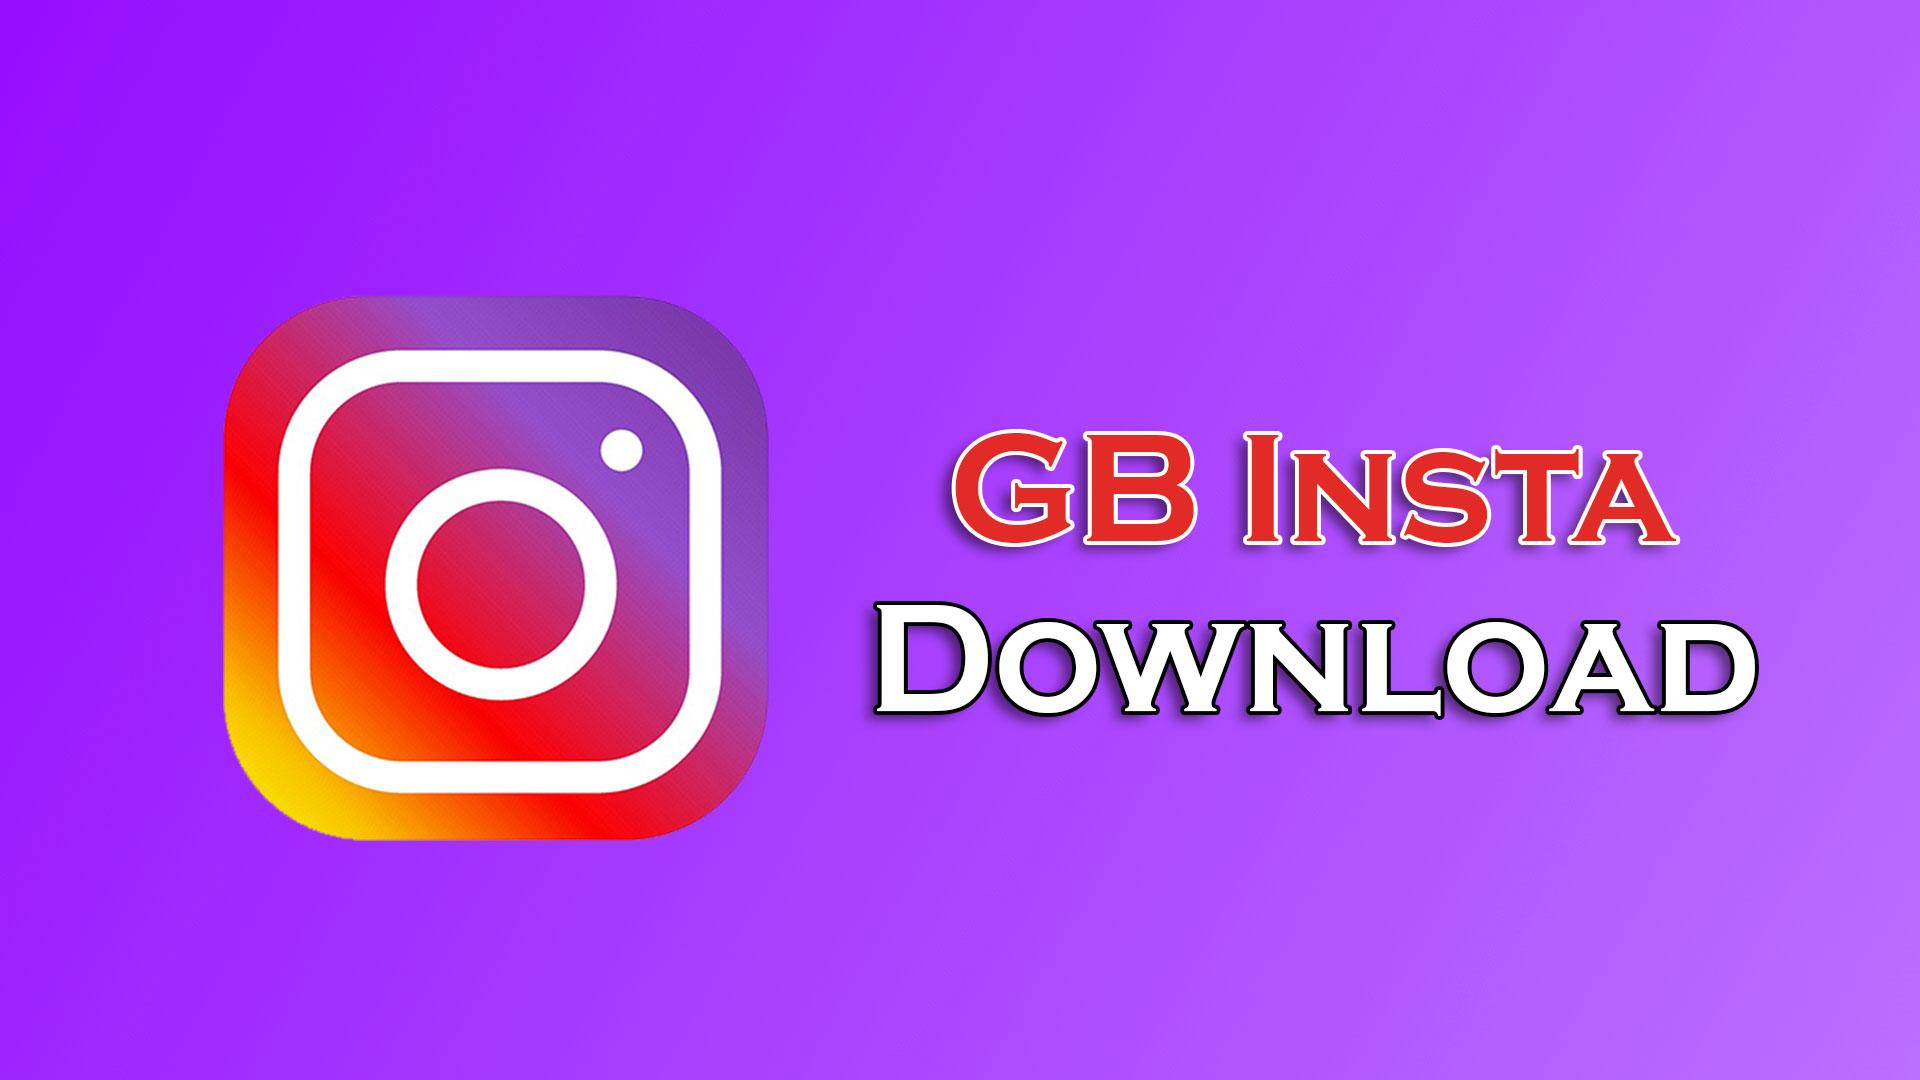 INSTAGRAM DOWNLOAD APK - GB Instagram Latest Version v1 50 APK Free